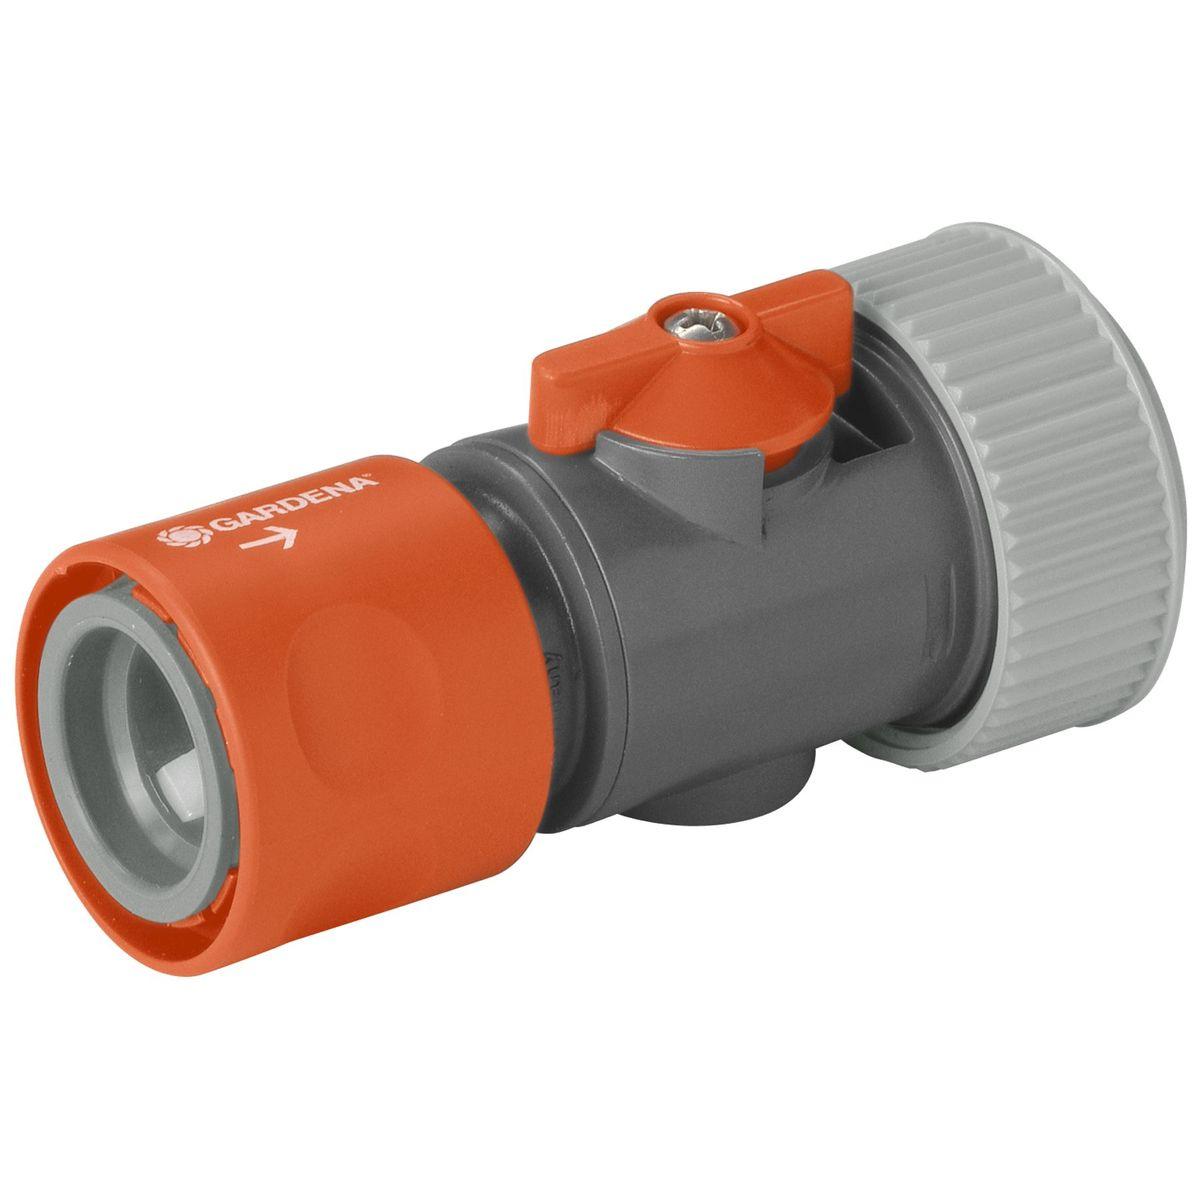 Коннектор с регулятором 3/4 Gardena02943-29.000.00вход шланга.